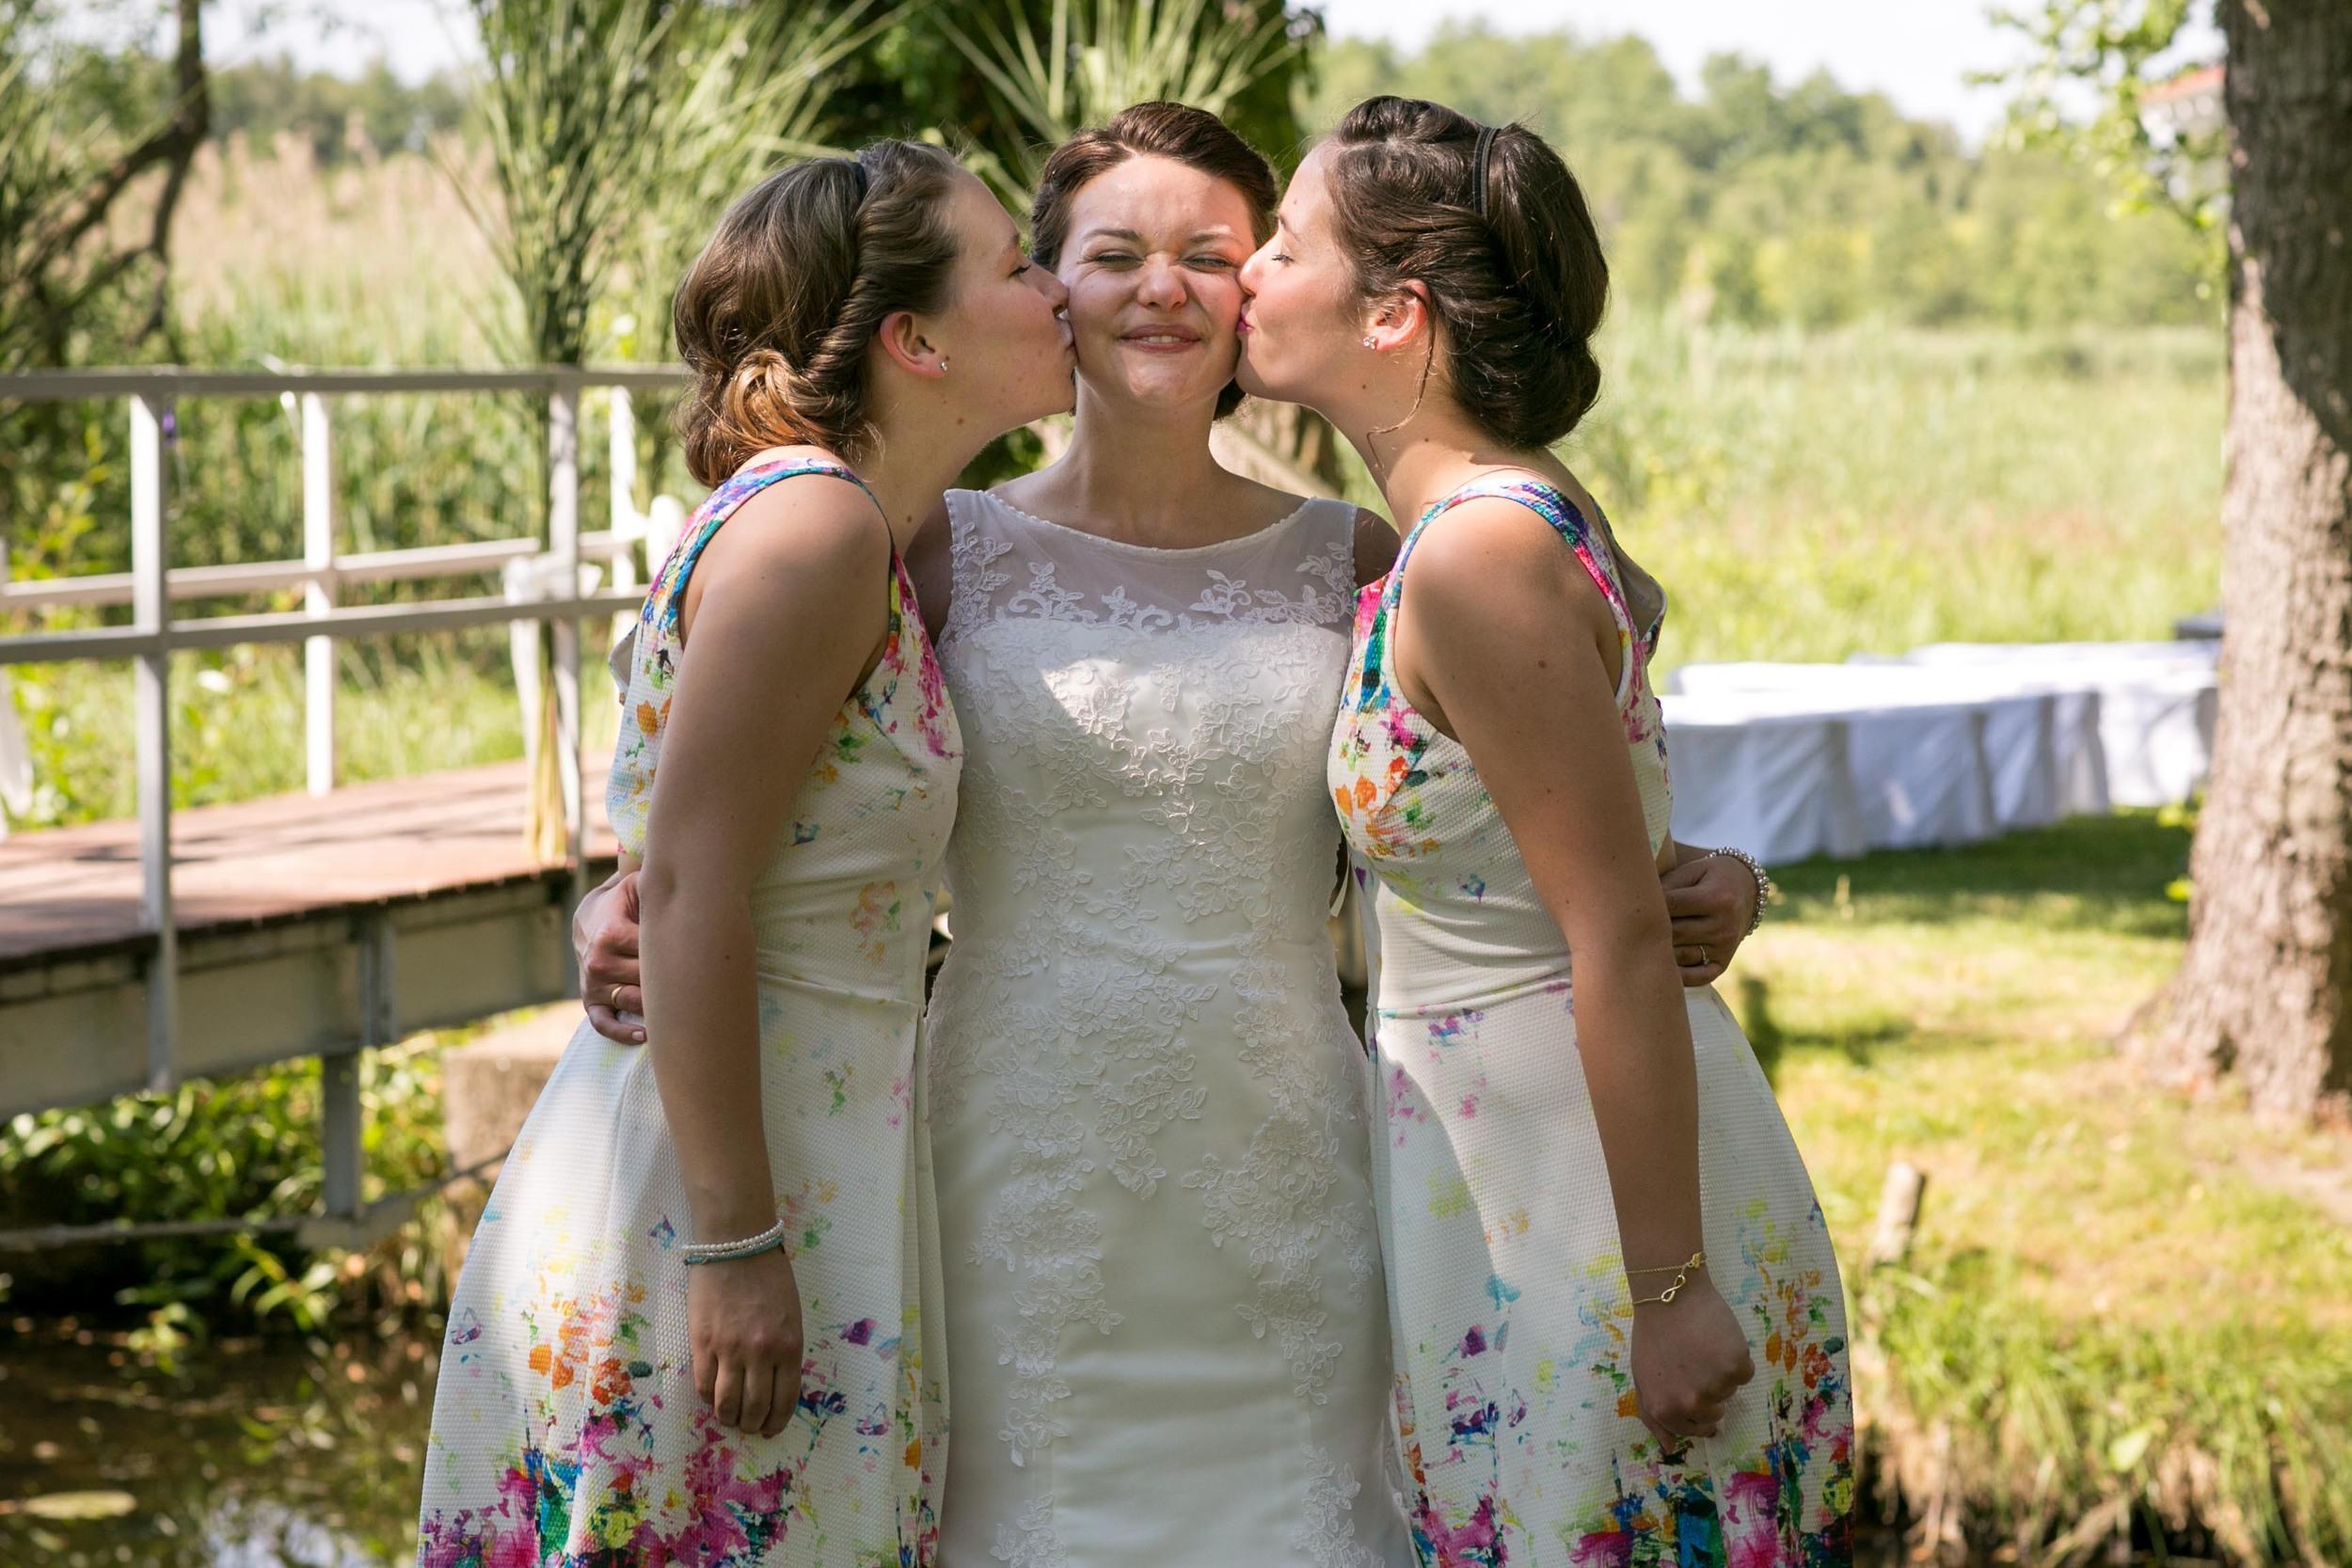 Hochzeitsfotografie Berlin_Fran Burrows Fotografie-329.jpg